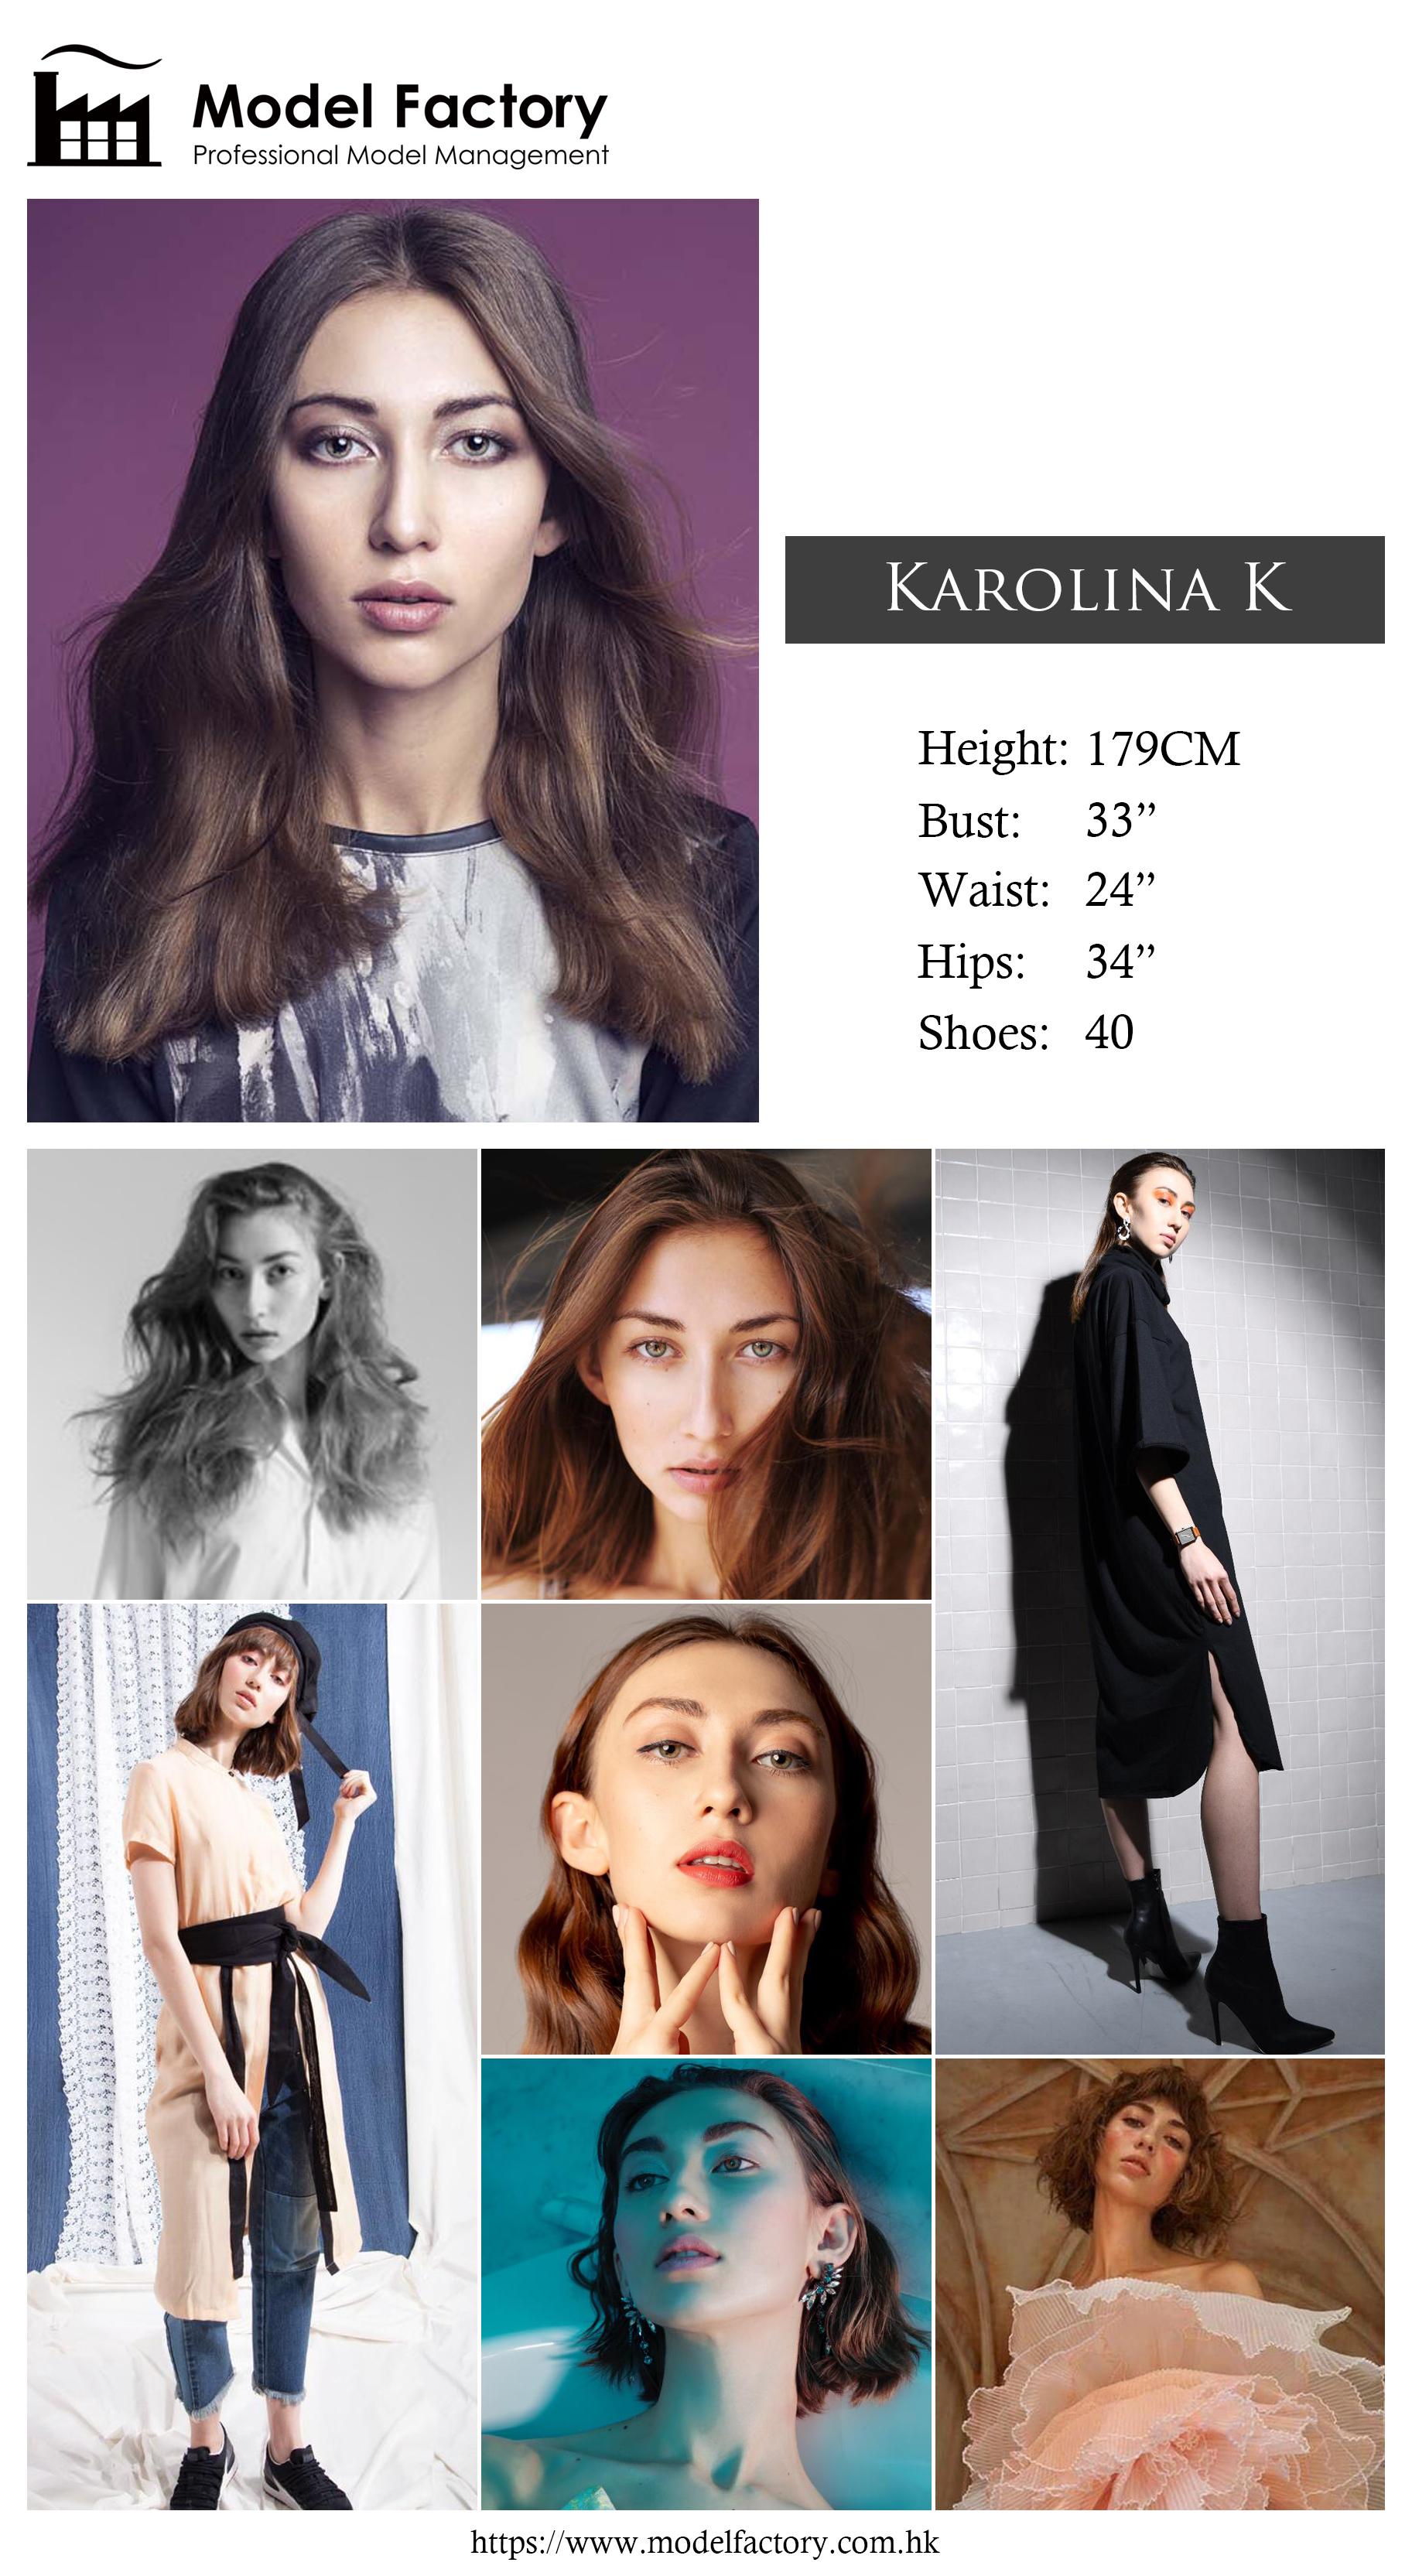 Model Factory Caucasian Female Model KarolinaK